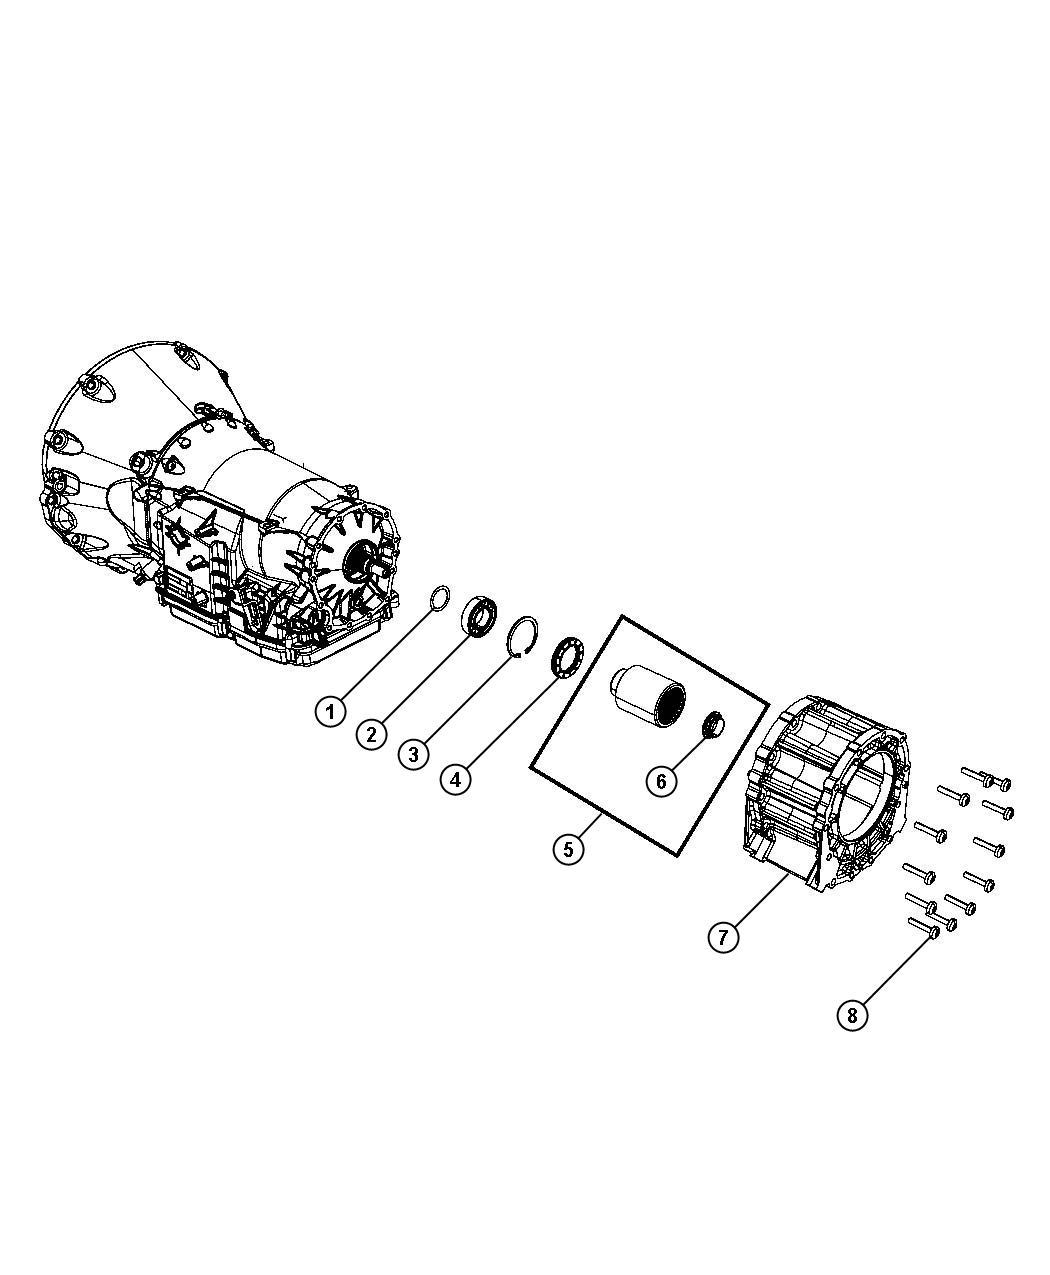 2012 Jeep Grand Cherokee Adapter. Transfer case